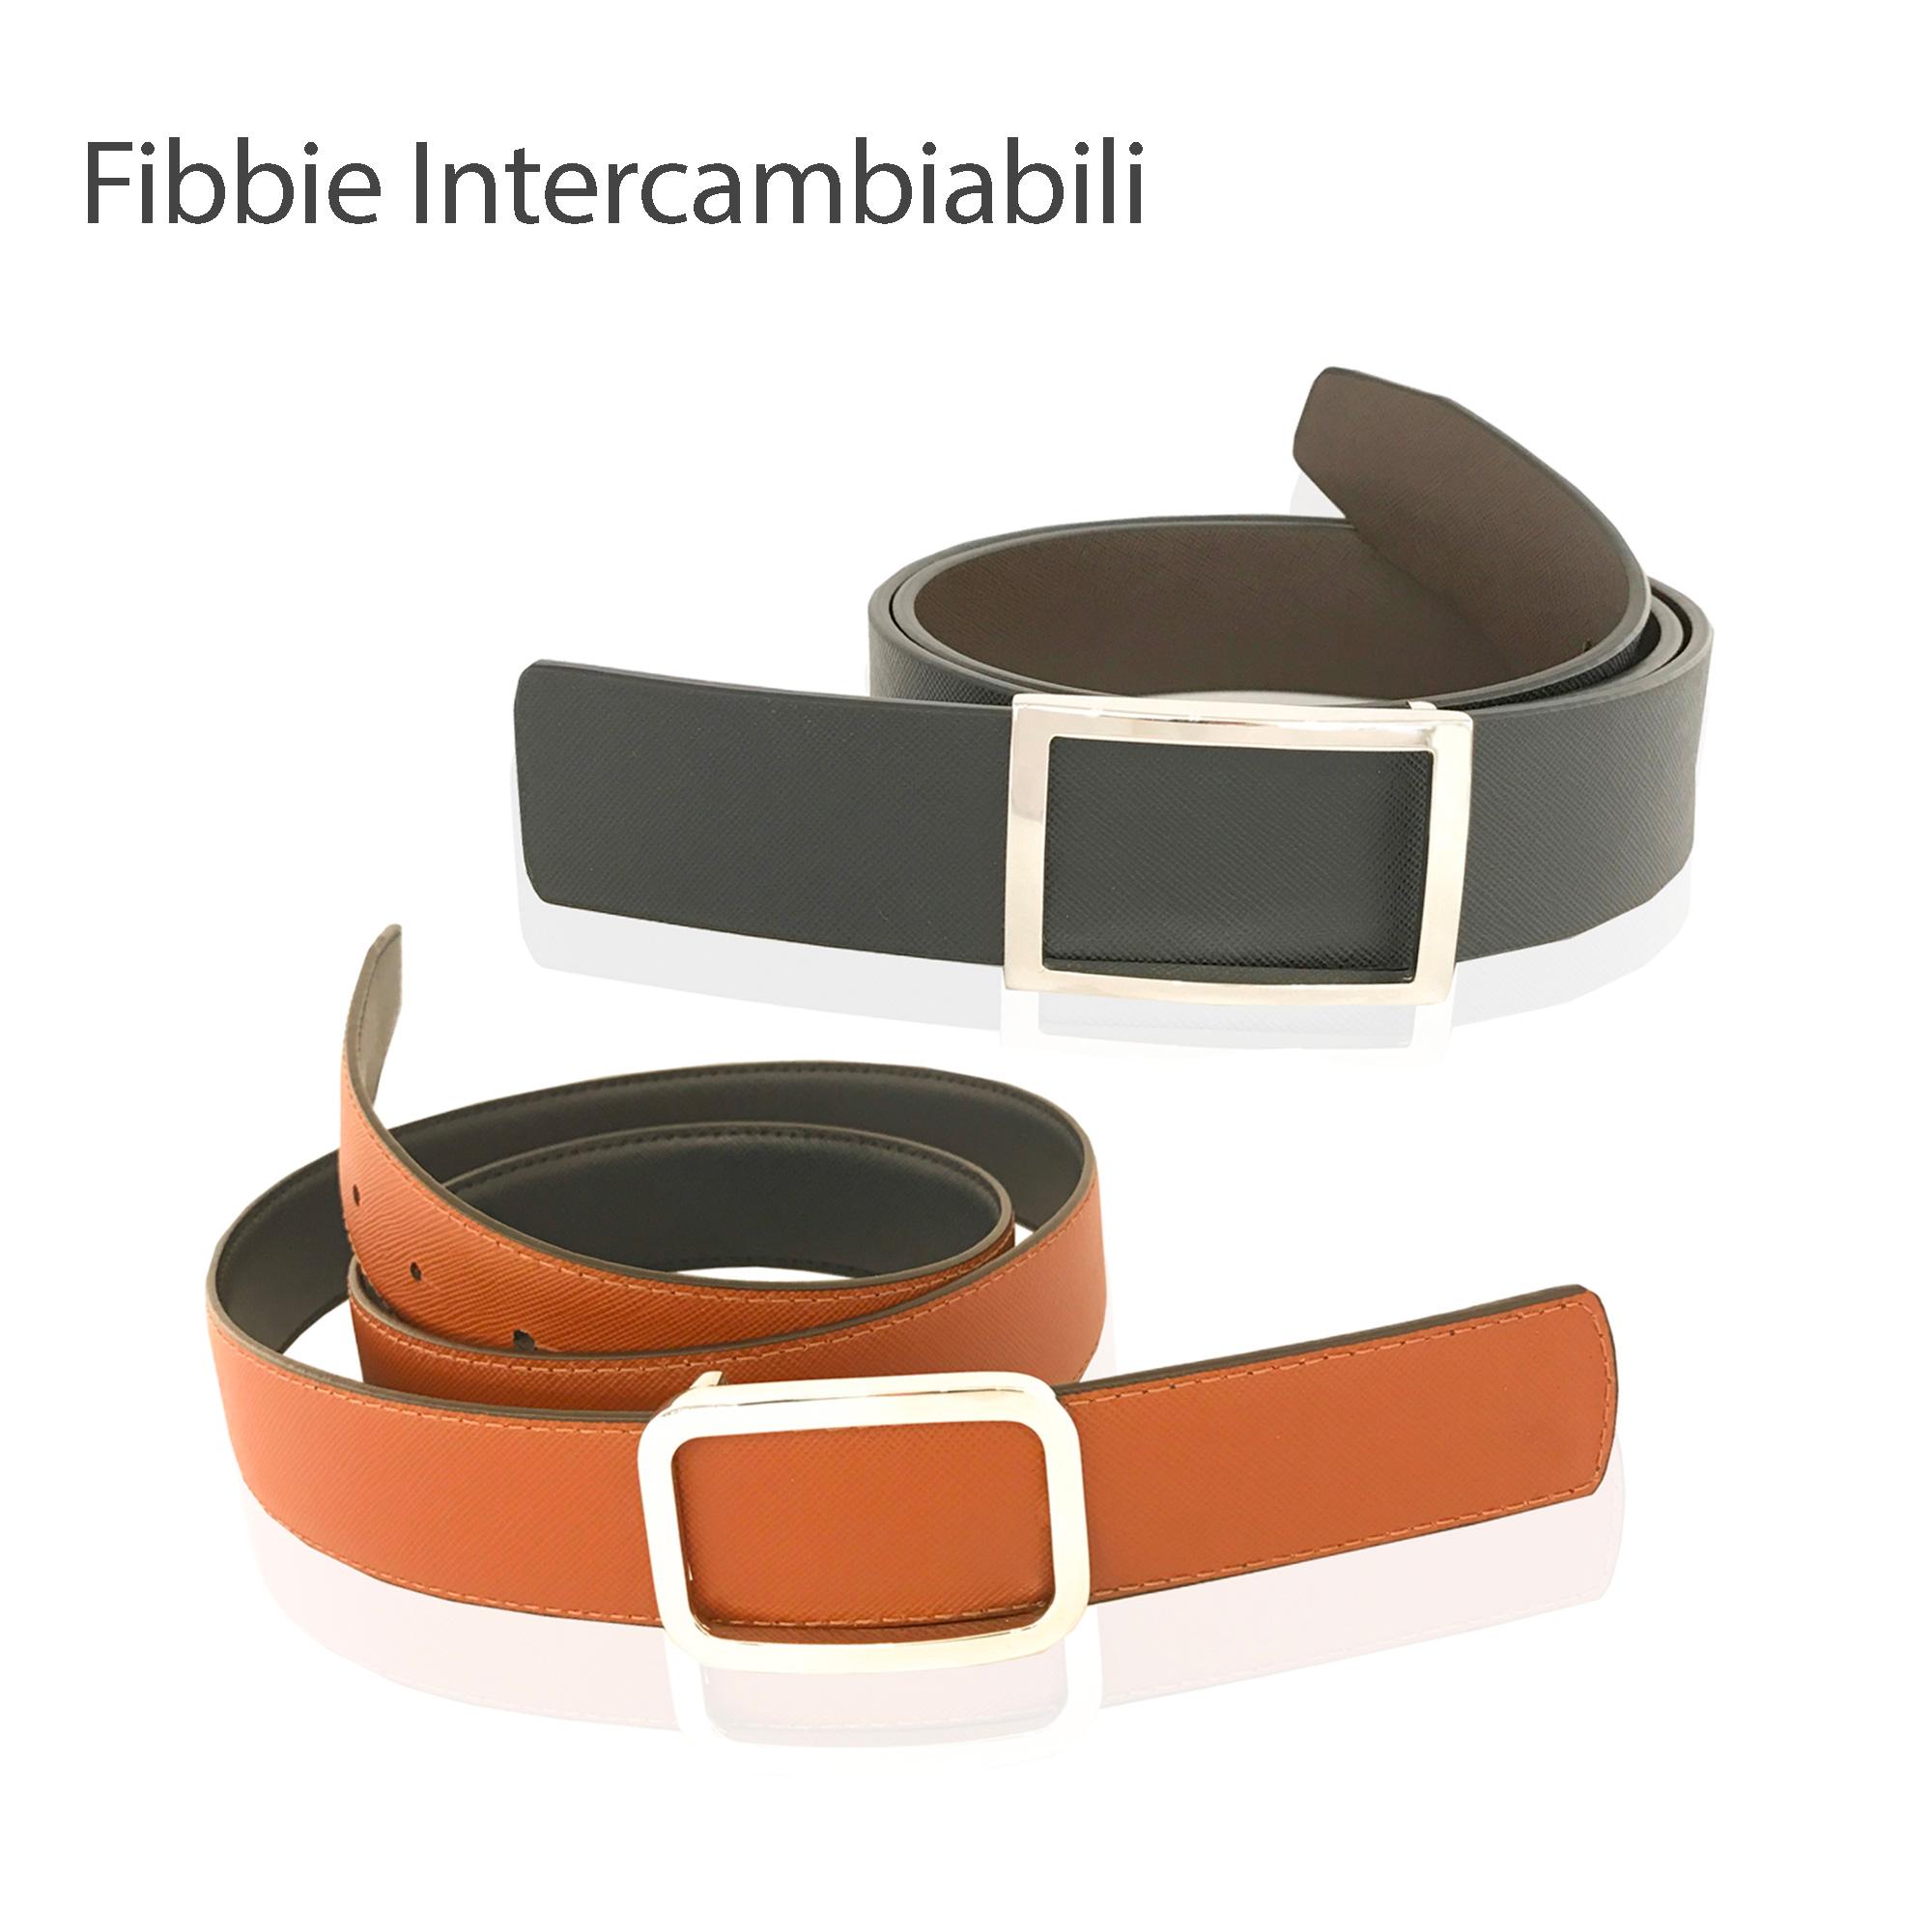 Fibbie Intercambiabili - Guimer Srl